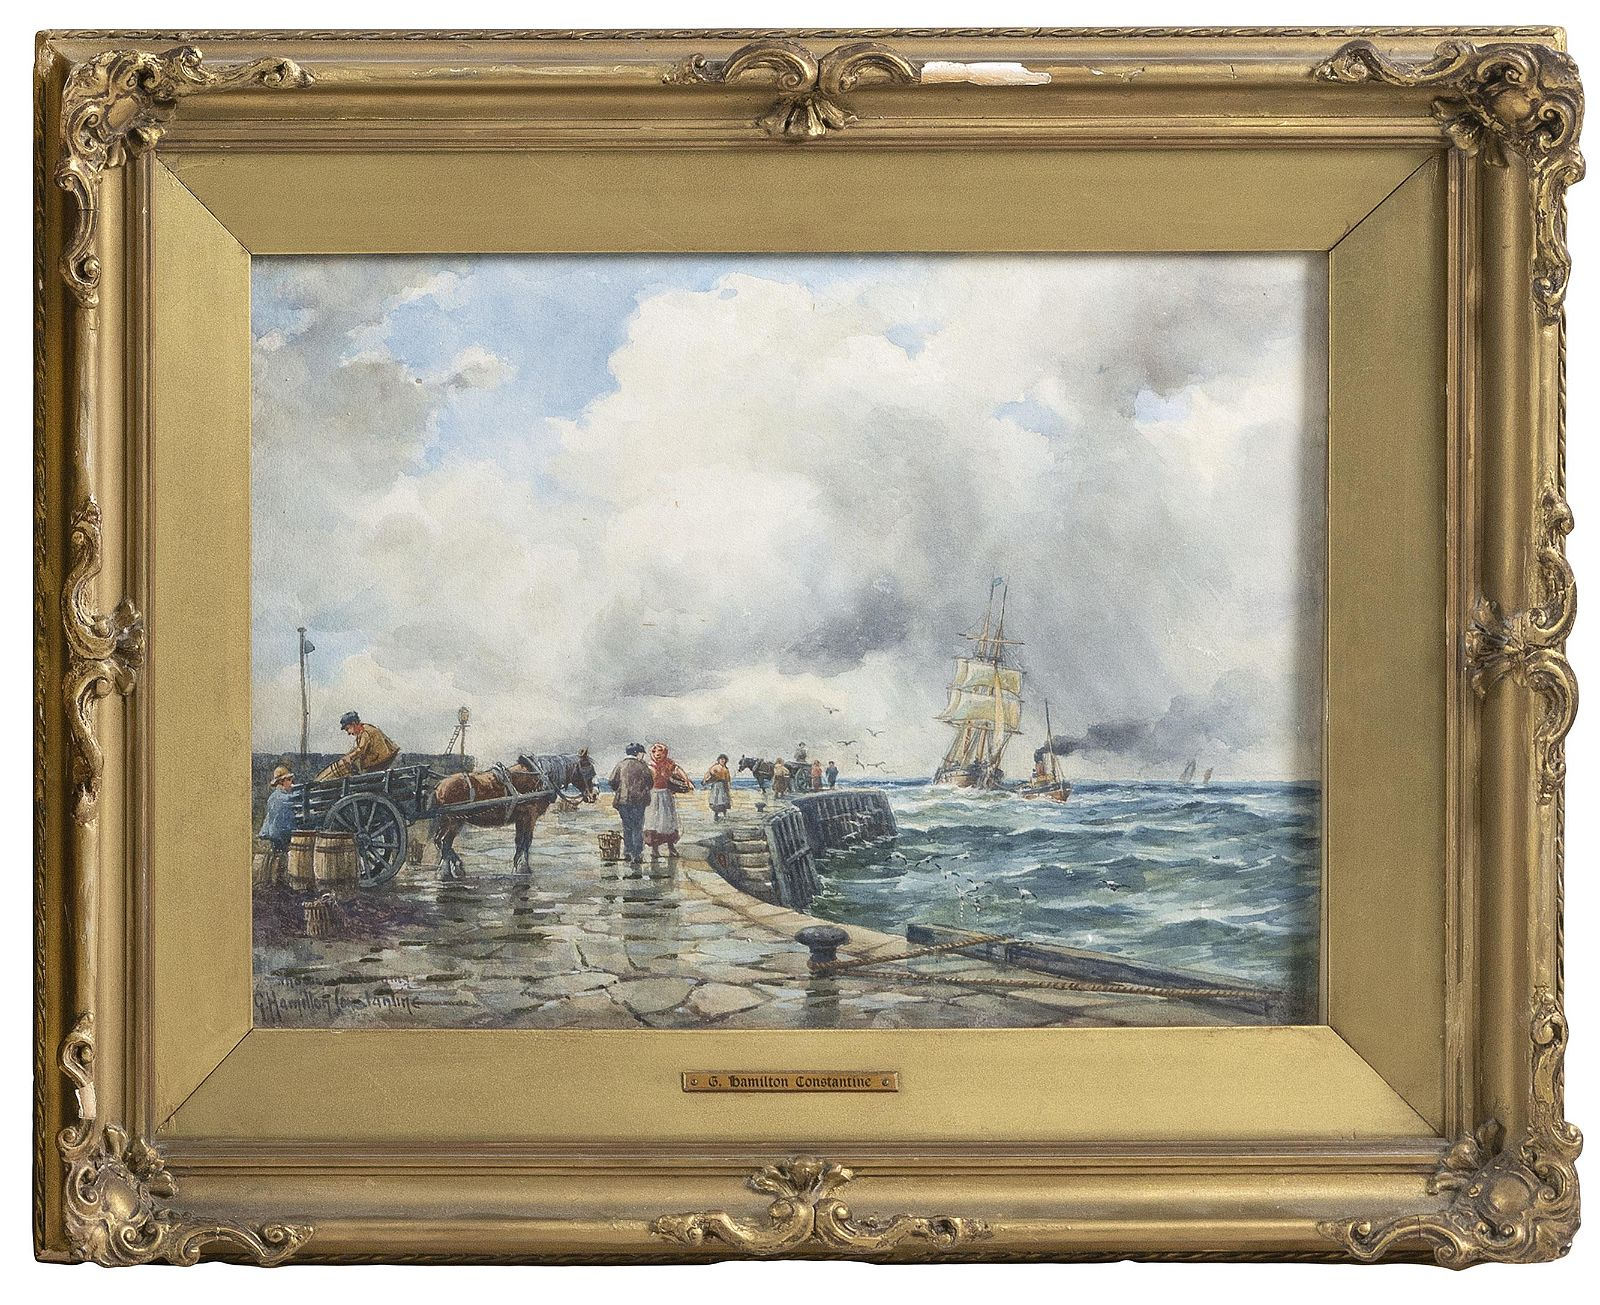 GEORGE HAMILTON CONSTANTINE England 1875-1967 Bustling